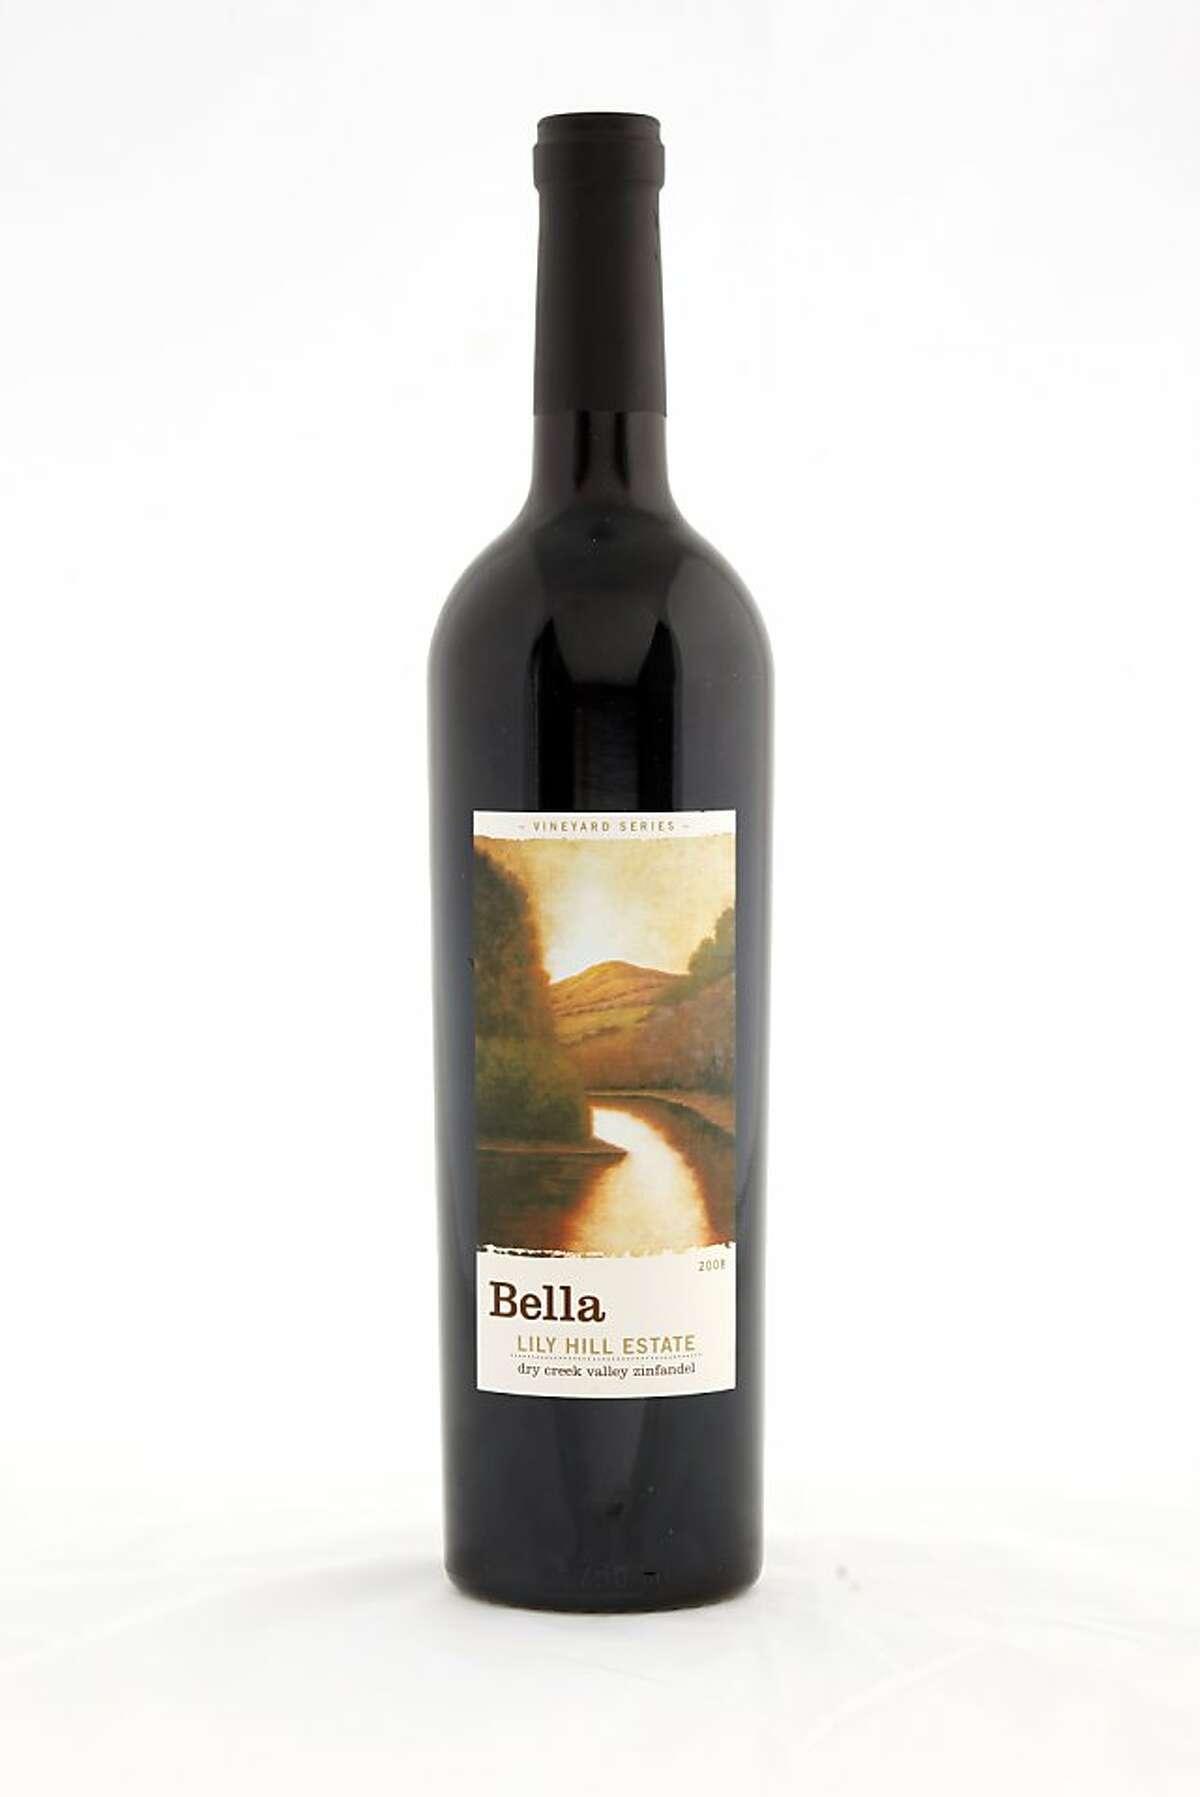 2008 Bella Lily Hill Dry Creek Valley Zinfandel